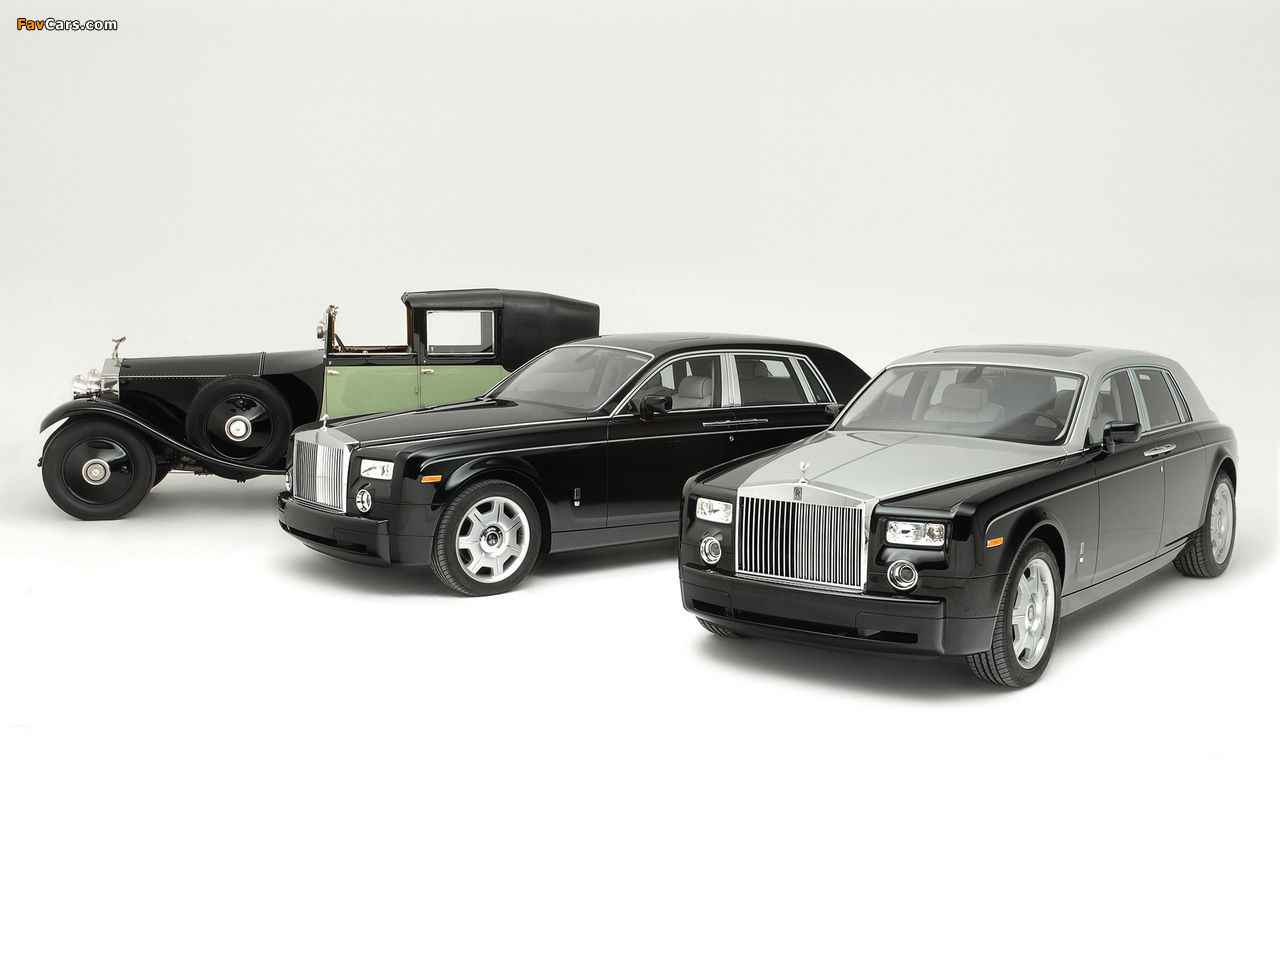 Rolls-Royce images (1280 x 960)